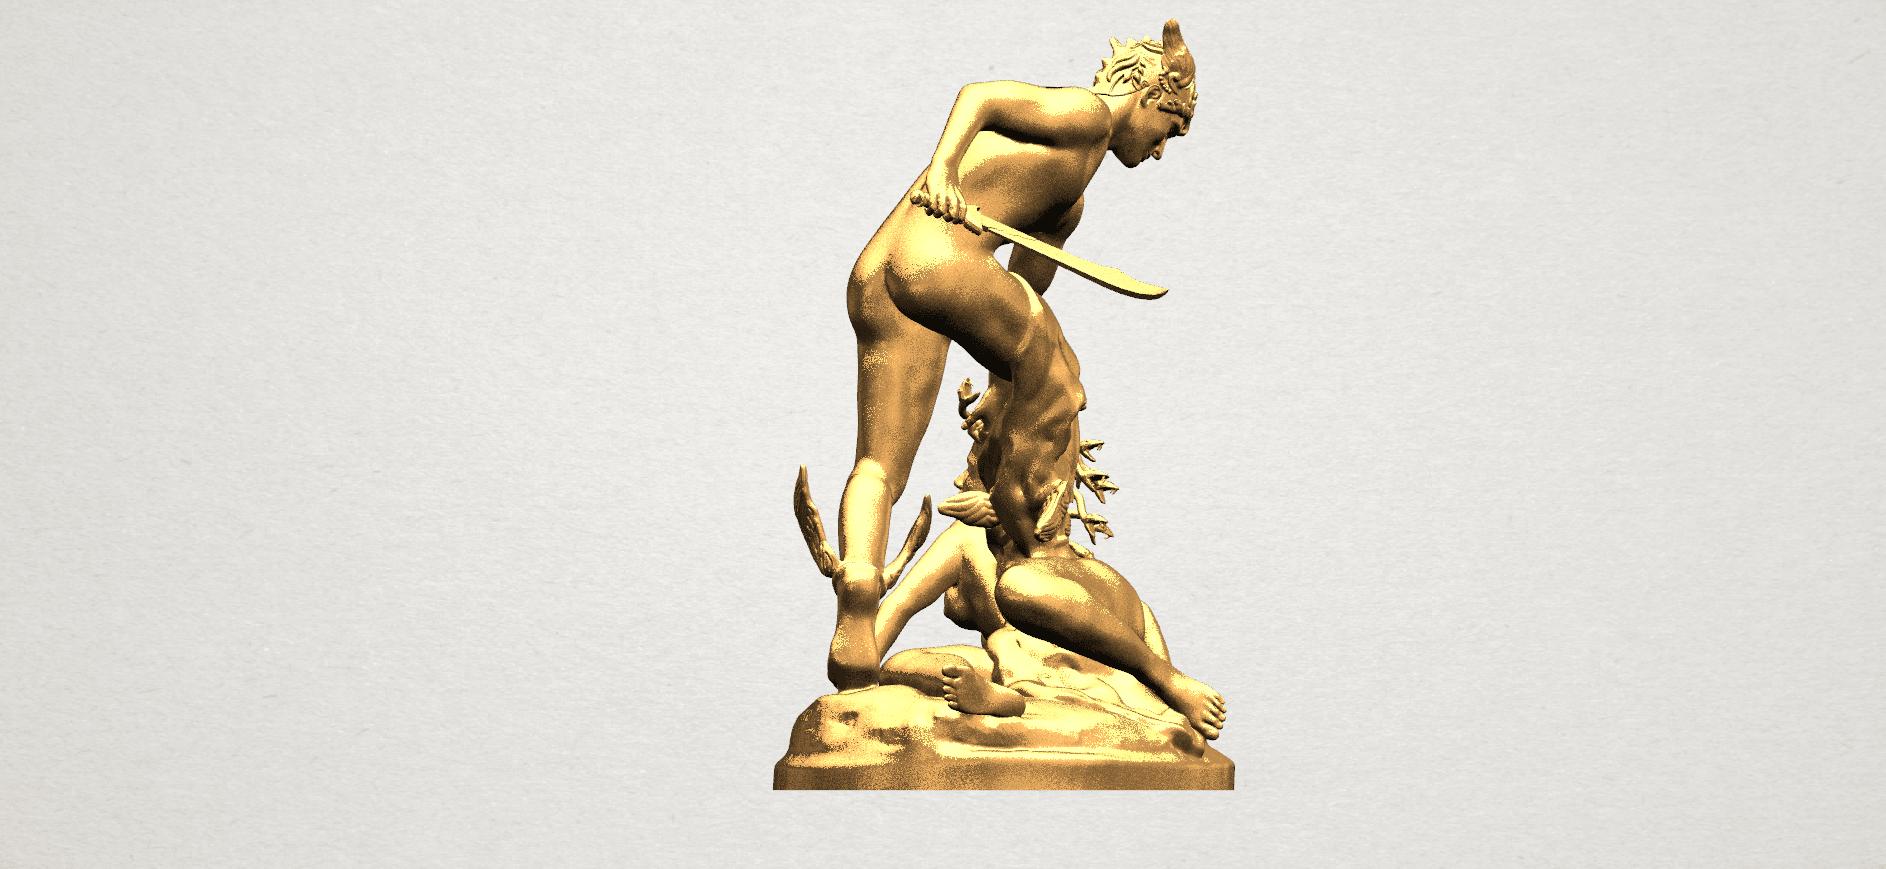 Killing - A04.png Download free STL file Killing 01 • 3D printable model, GeorgesNikkei